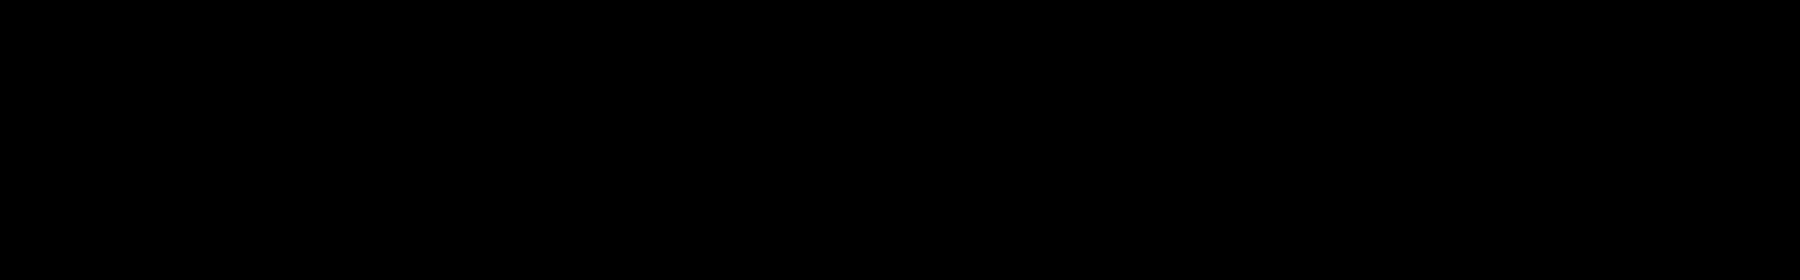 Jumping Trap audio waveform